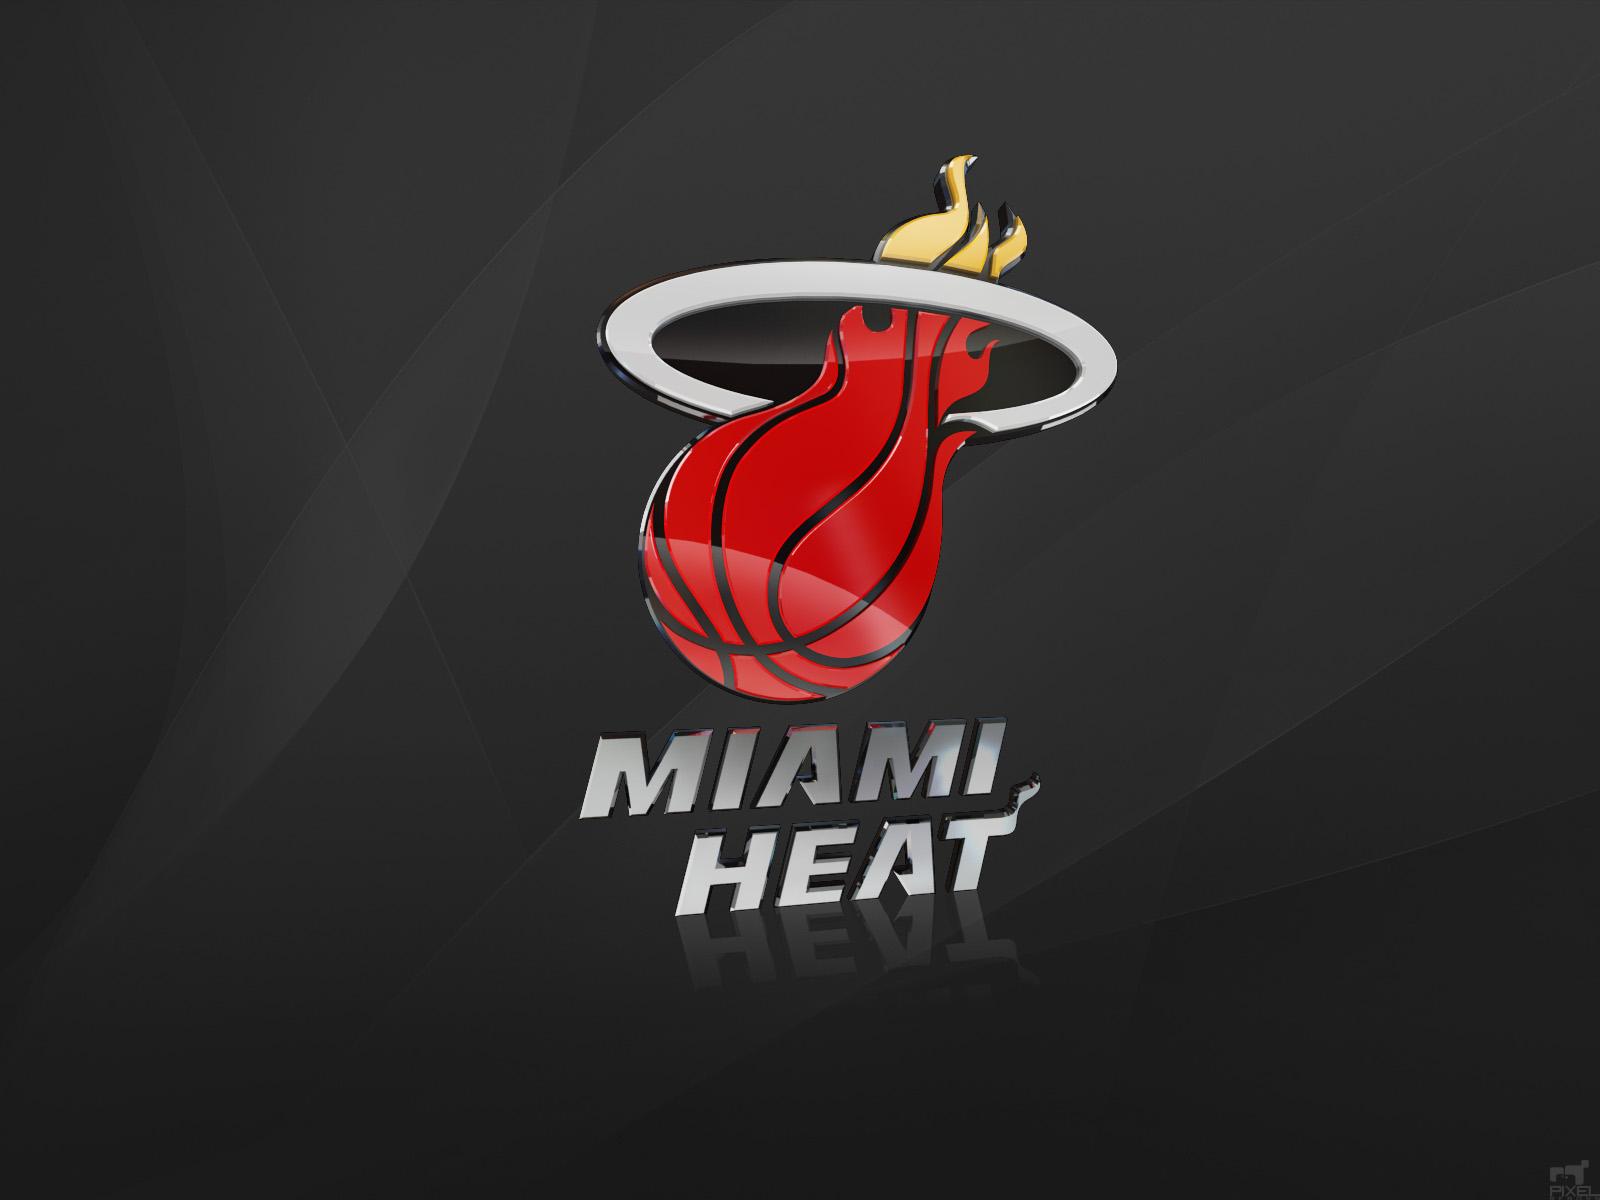 Nba Basketball Miami Heat Bedroom In: WALLPAPER: MIAMI HEAT NBA CLUB LOGO